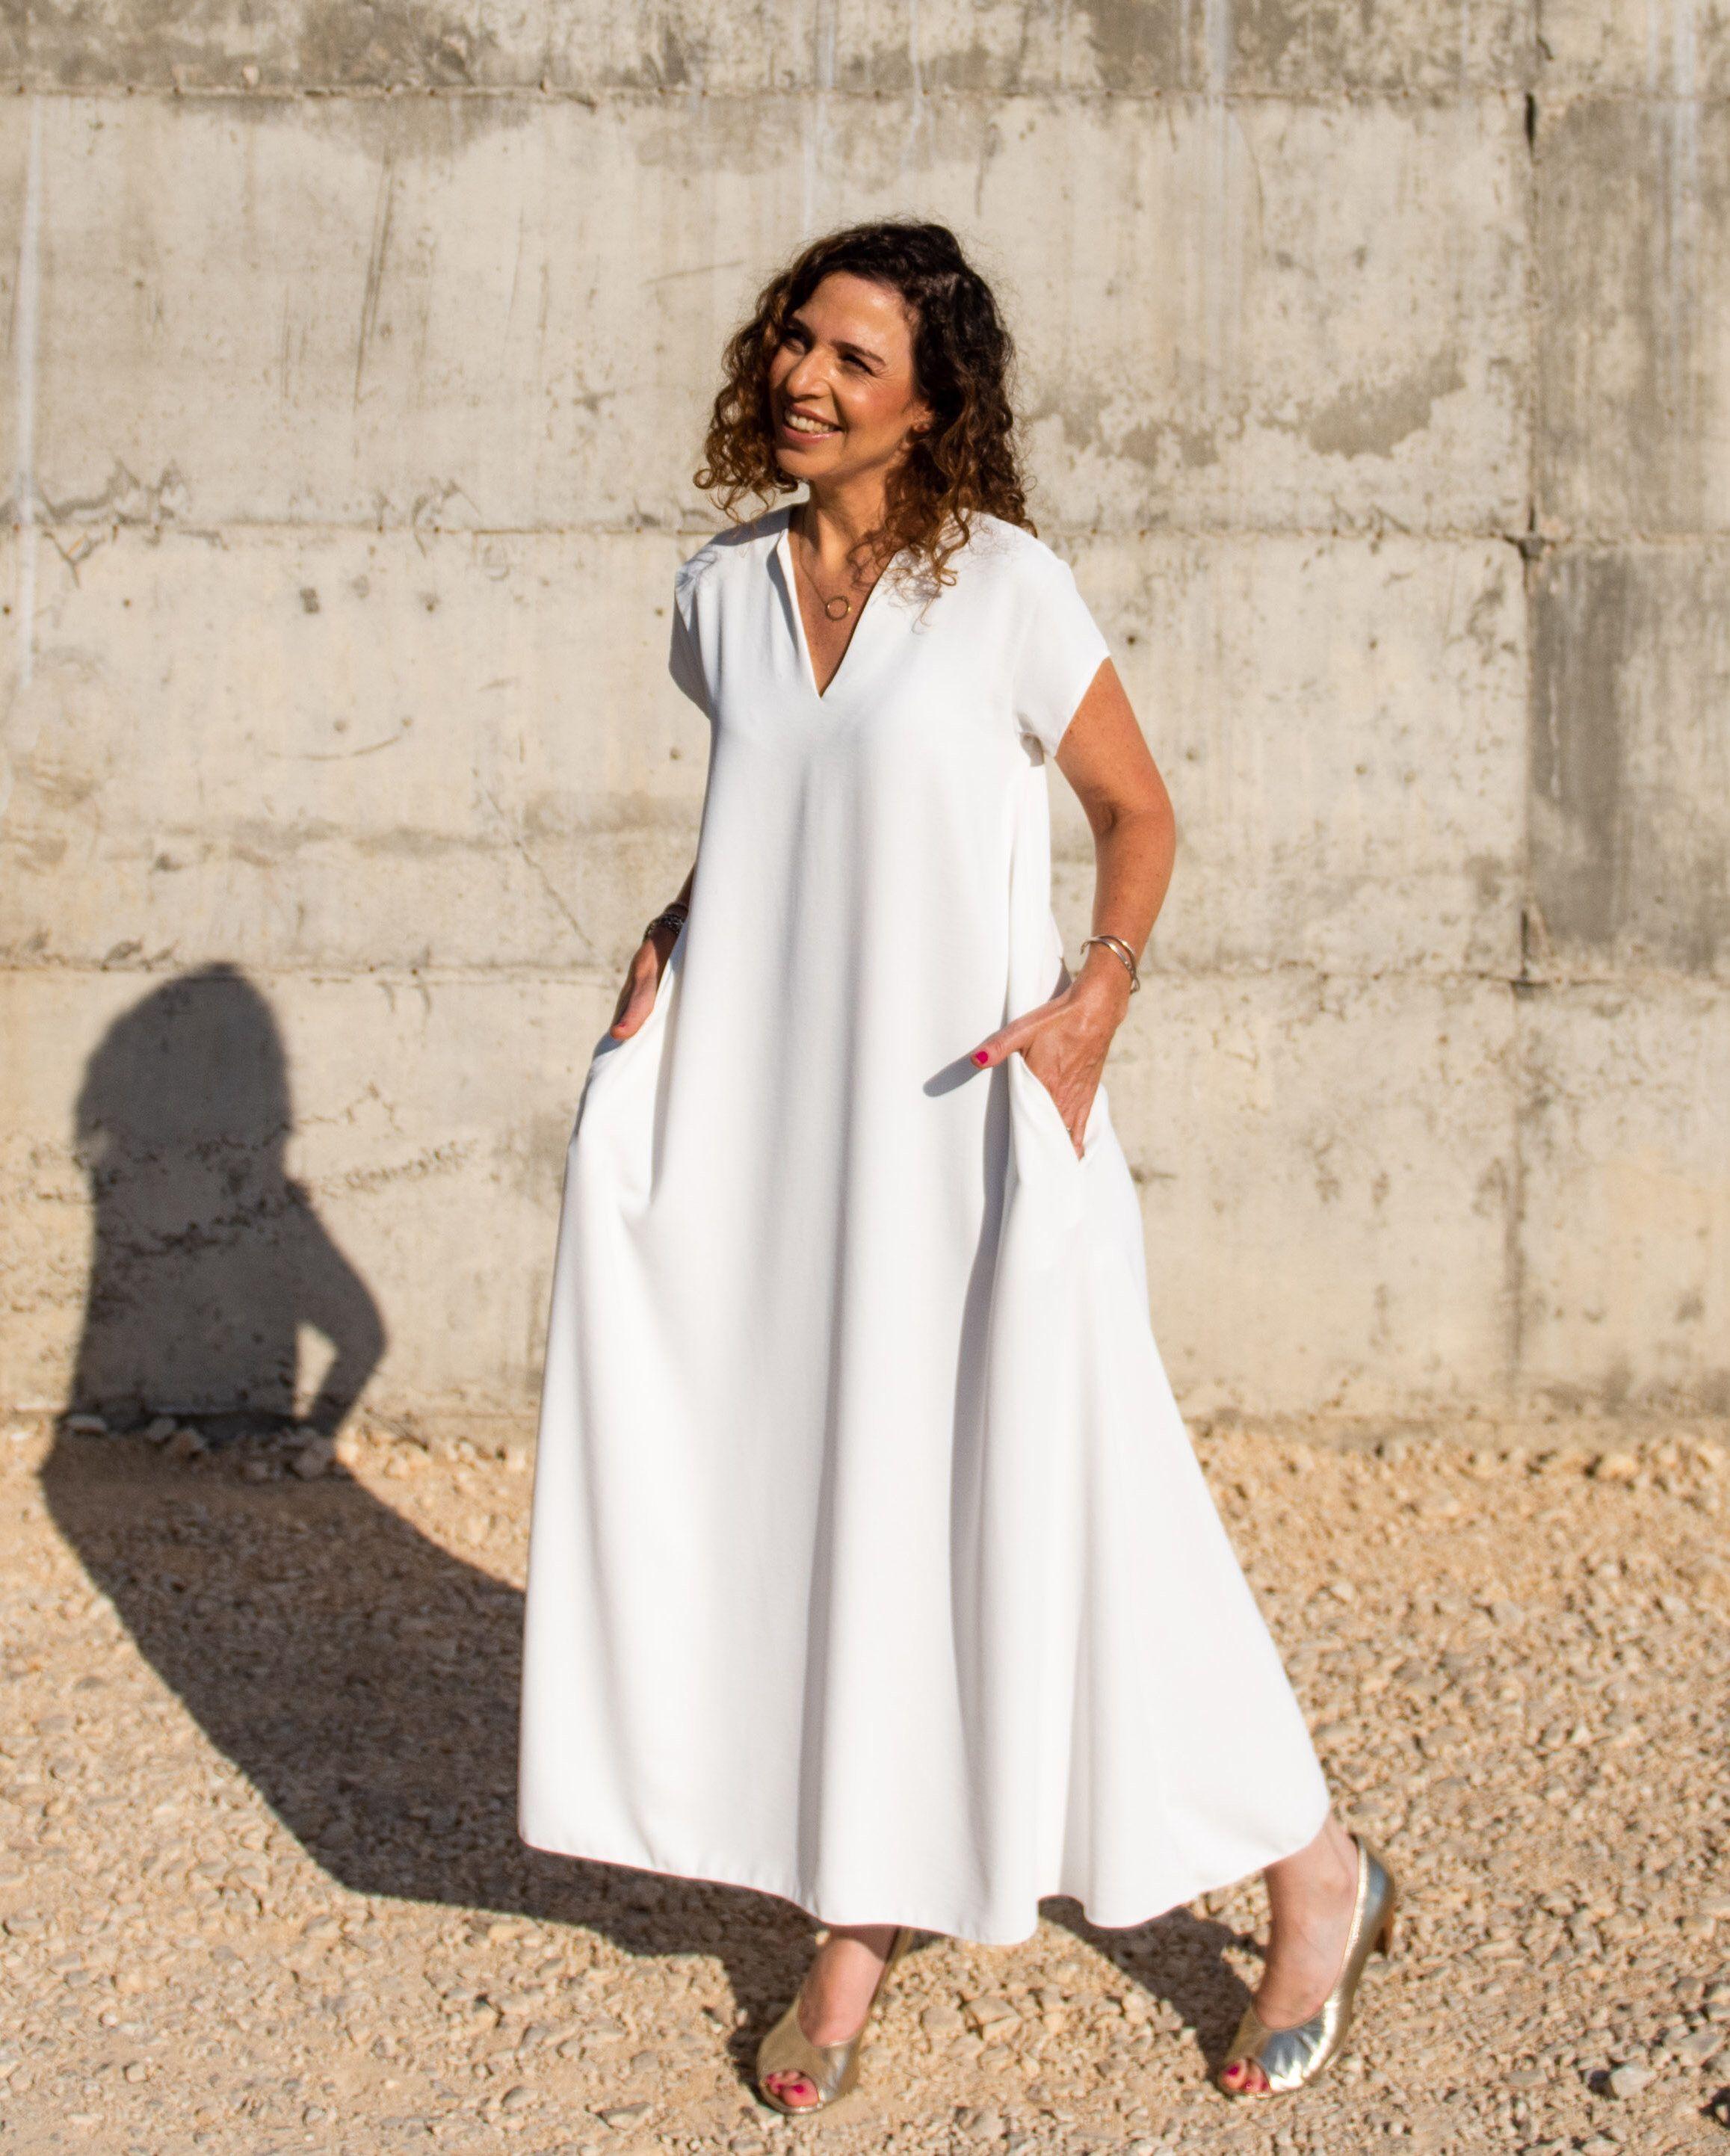 White Dress Kaftan Dress White Caftan White Sari Trapeze Dress Maxi Dress With Sleeves V Nec White Plus Size Dresses Maxi Dress With Sleeves Kaftan Dress [ 2885 x 2315 Pixel ]